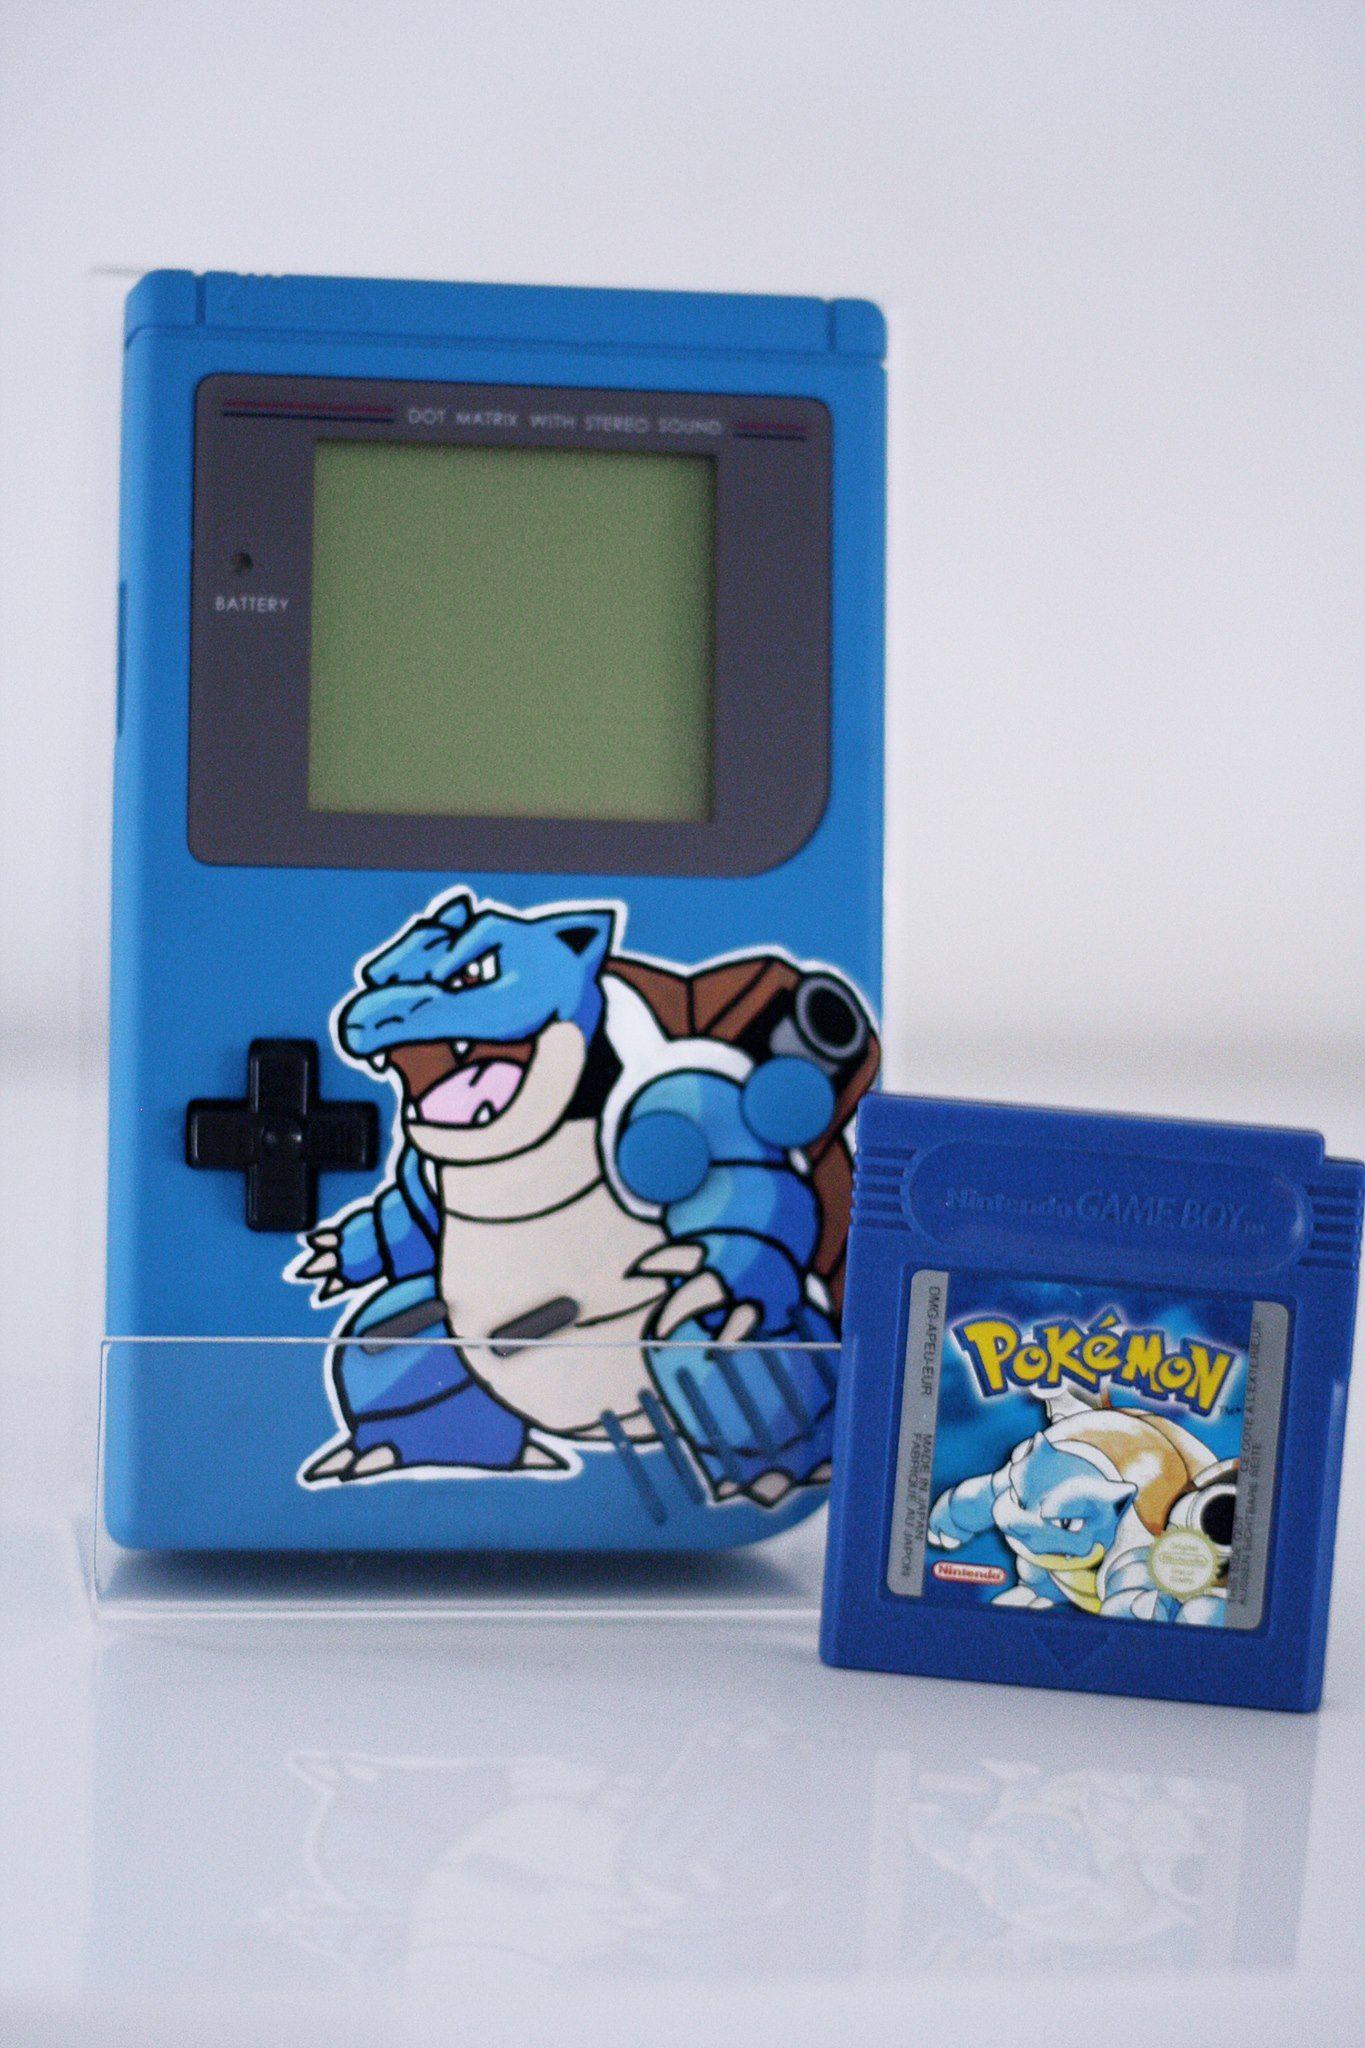 Pokémon Blue Game Boy DMG Blastoise Gameboy, Pokemon